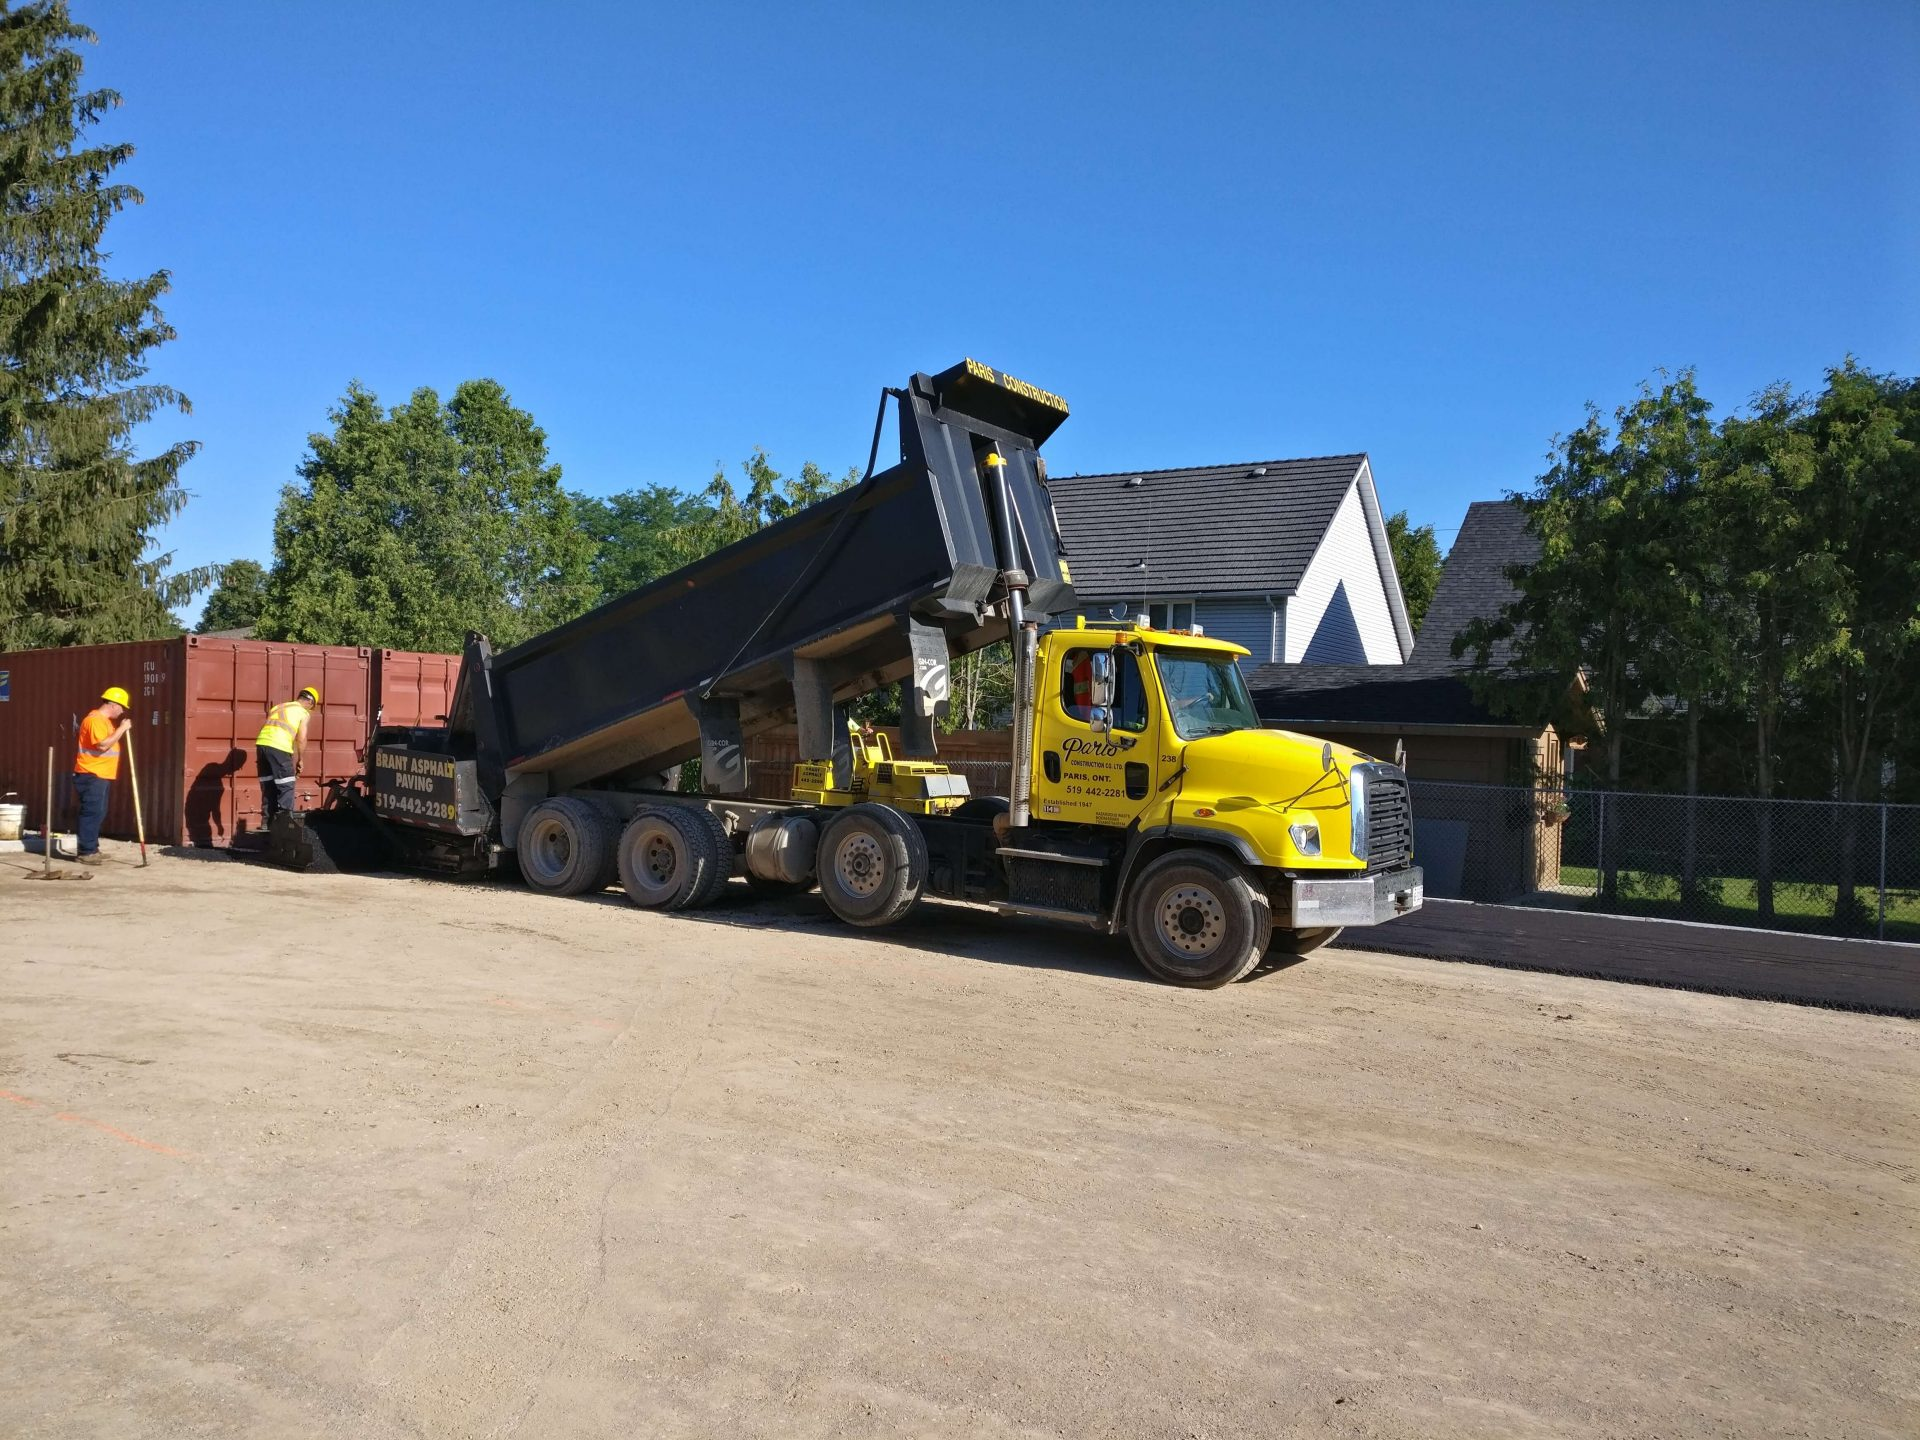 Paris Construction starting paving operations